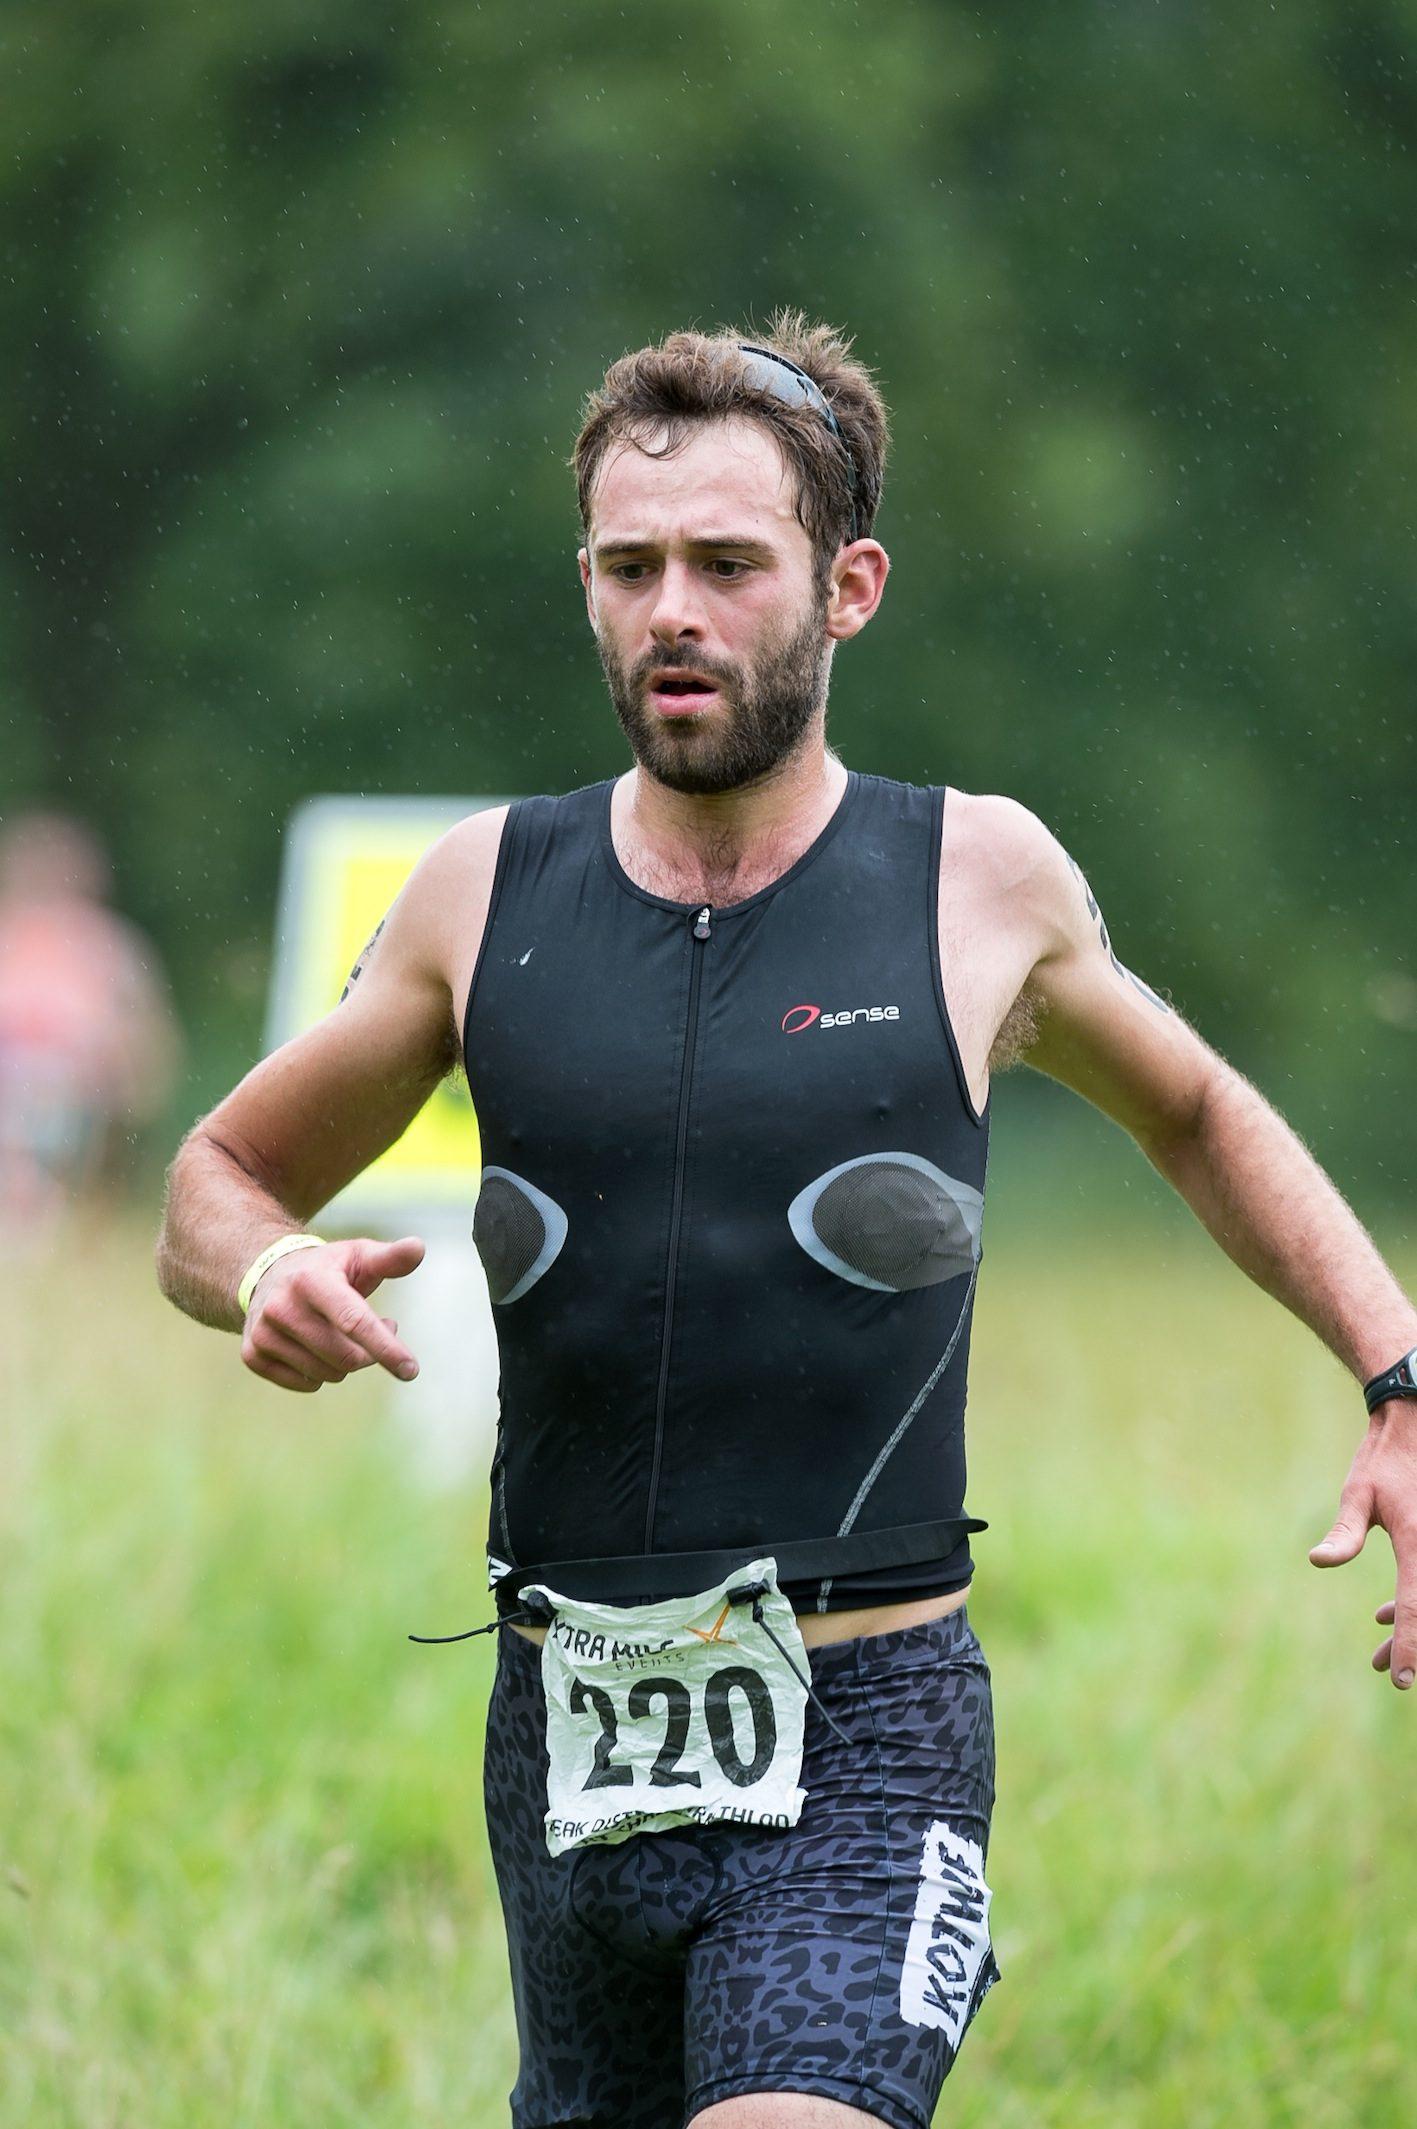 Sam Village racing at Peak District Triathlon